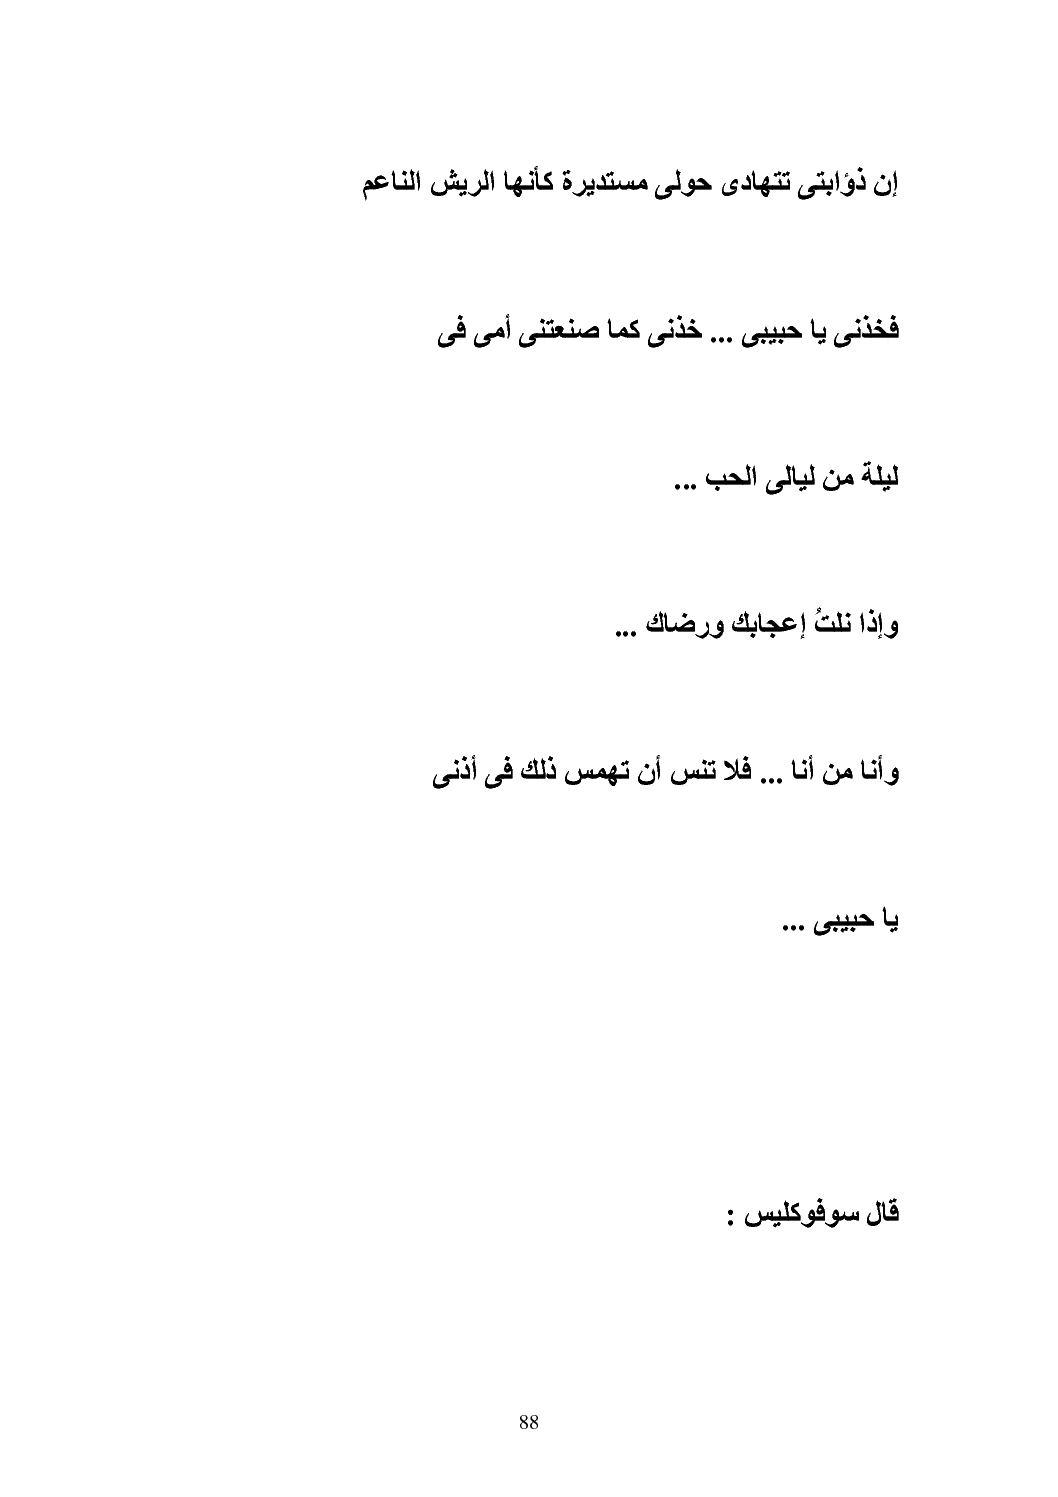 8a7cd47ab القبلة - مصطفى عبد الرحمن - CALAMEO Downloader